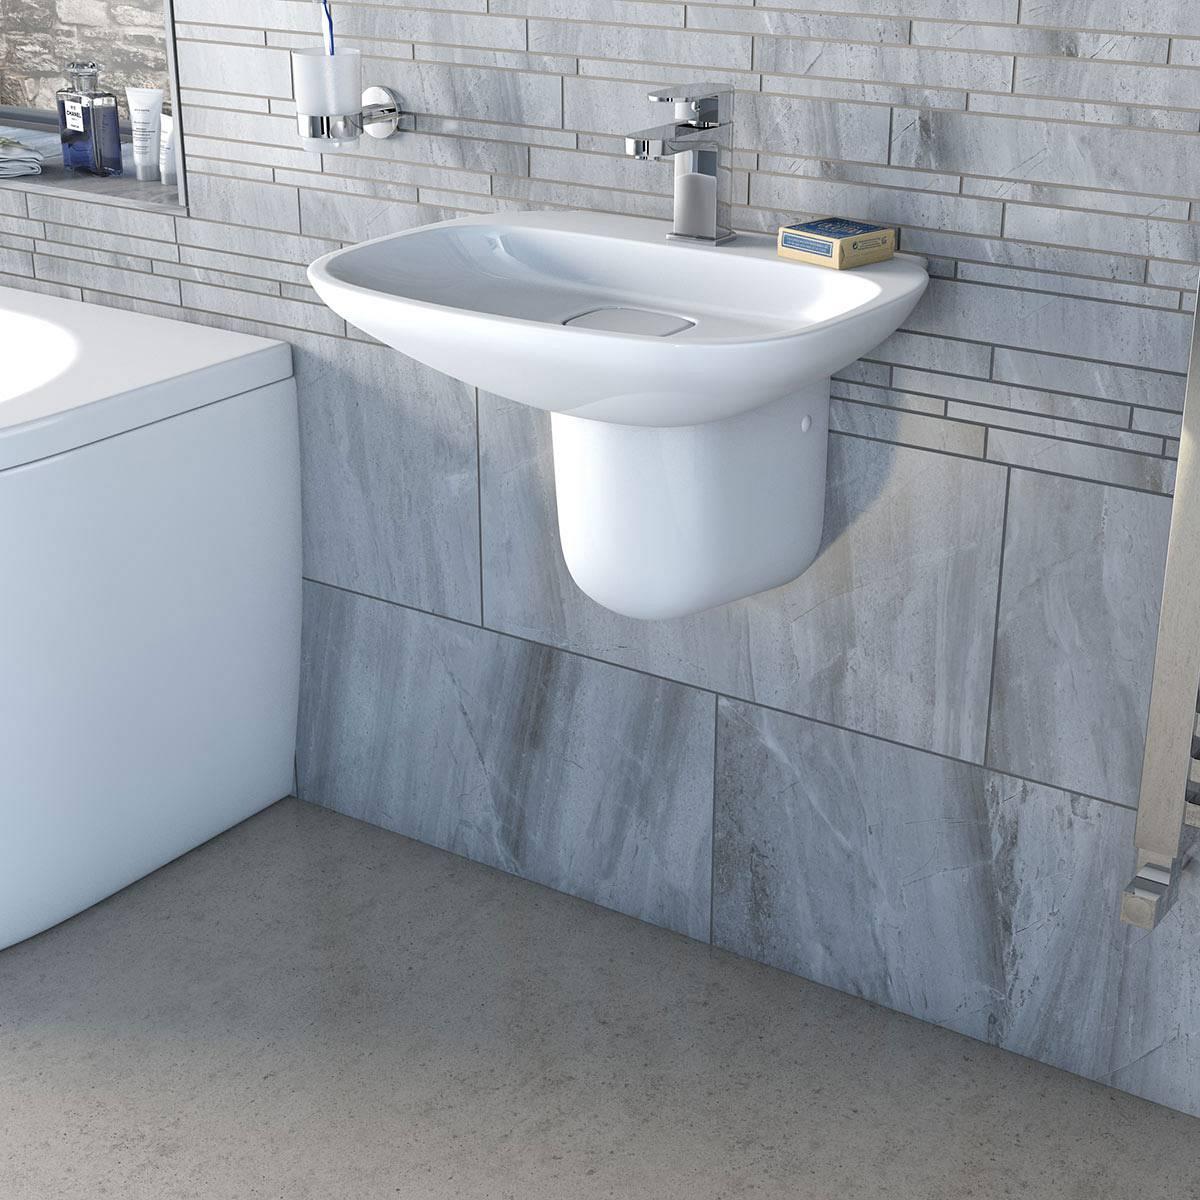 Bathroom Pedestal Sinks Ideas Fairbanks 1th 500mm Basin And Semi Pedestal Victoriaplum Com